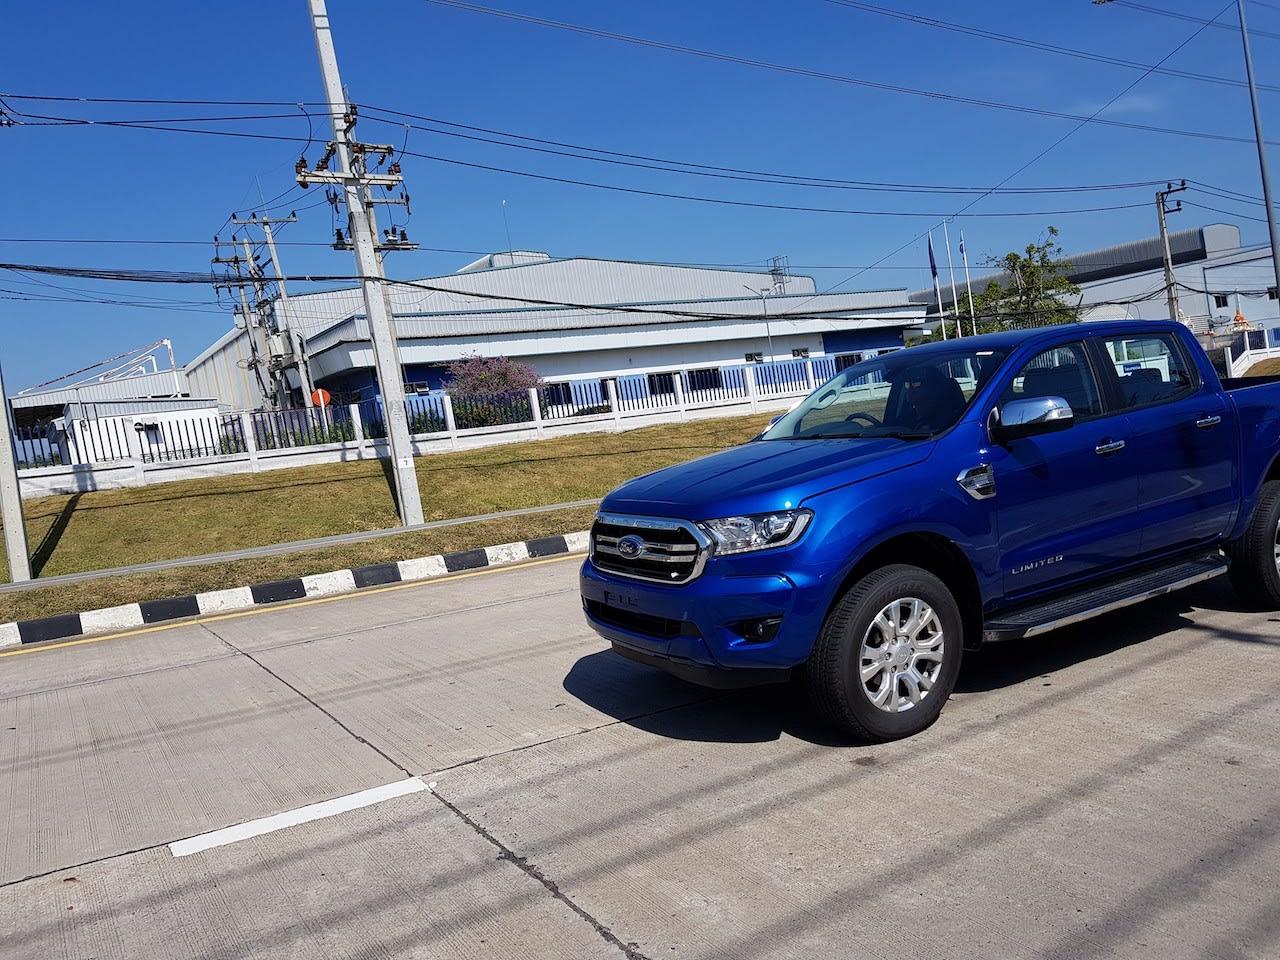 2018 Ford Ranger Caradvice 6